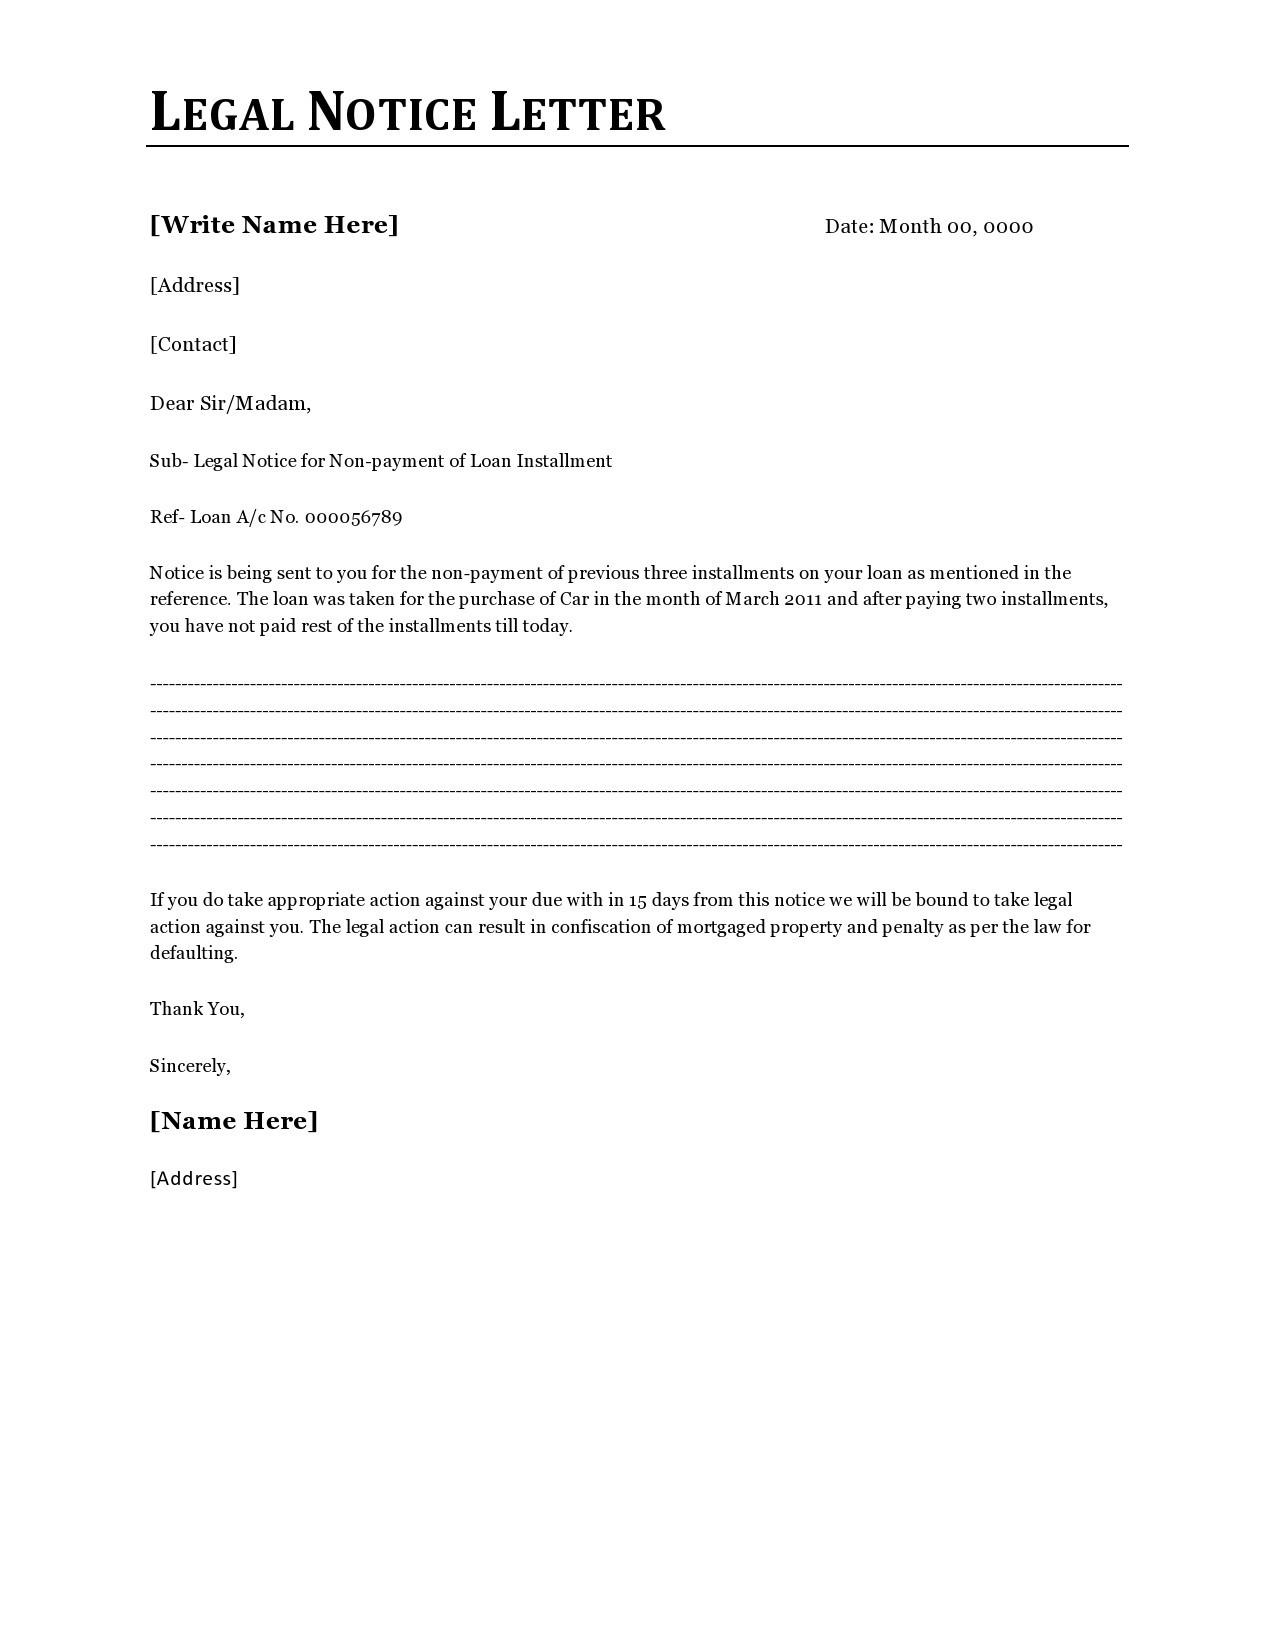 Free legal letter format 02